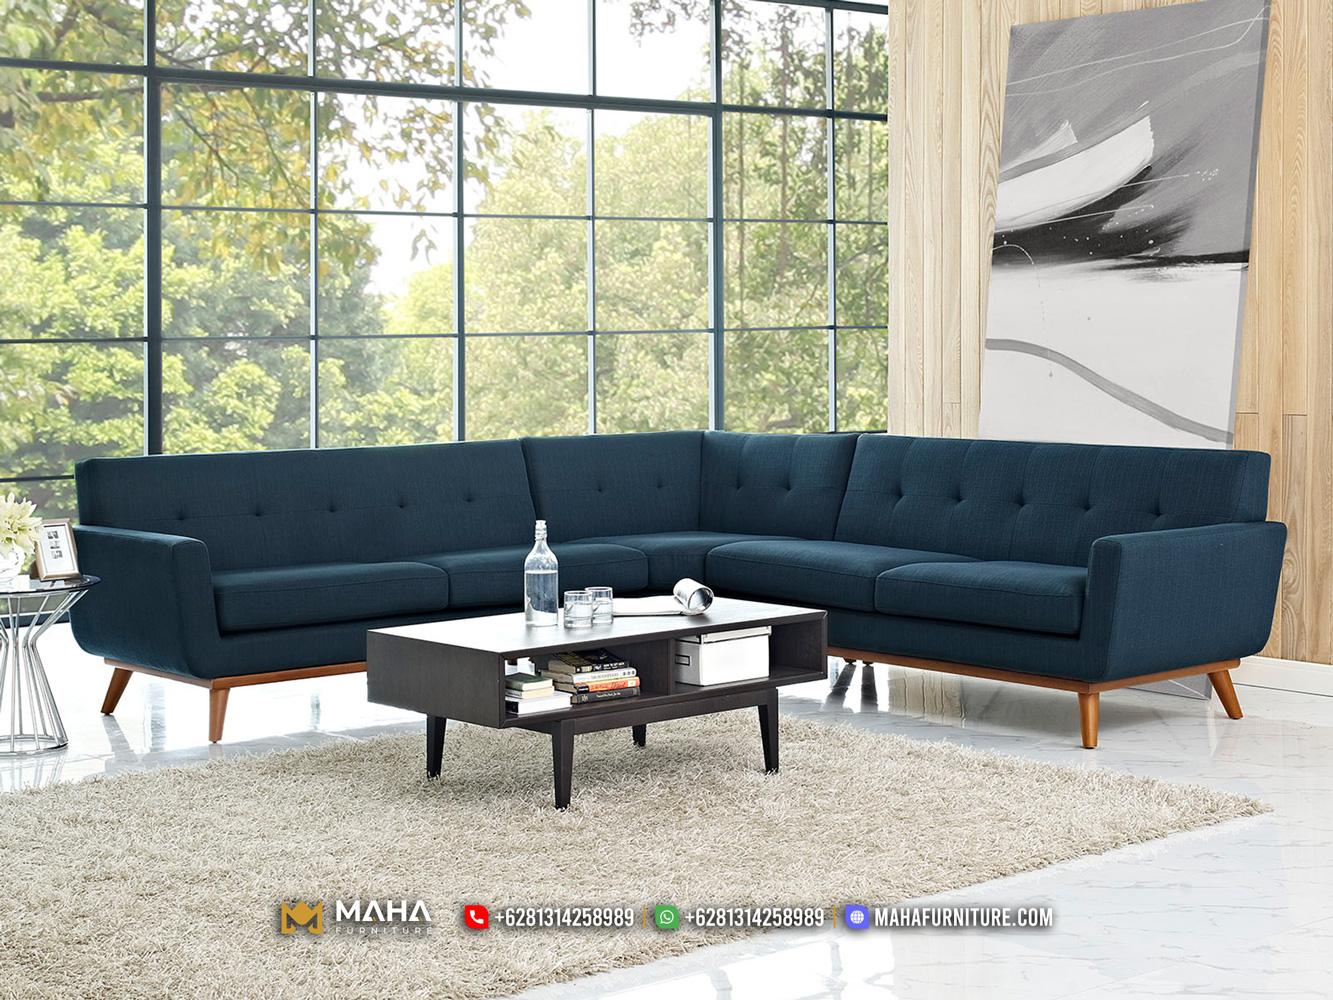 Desain Sofa Minimalis Jati Jepara Terbaru Excellent Denim MF255